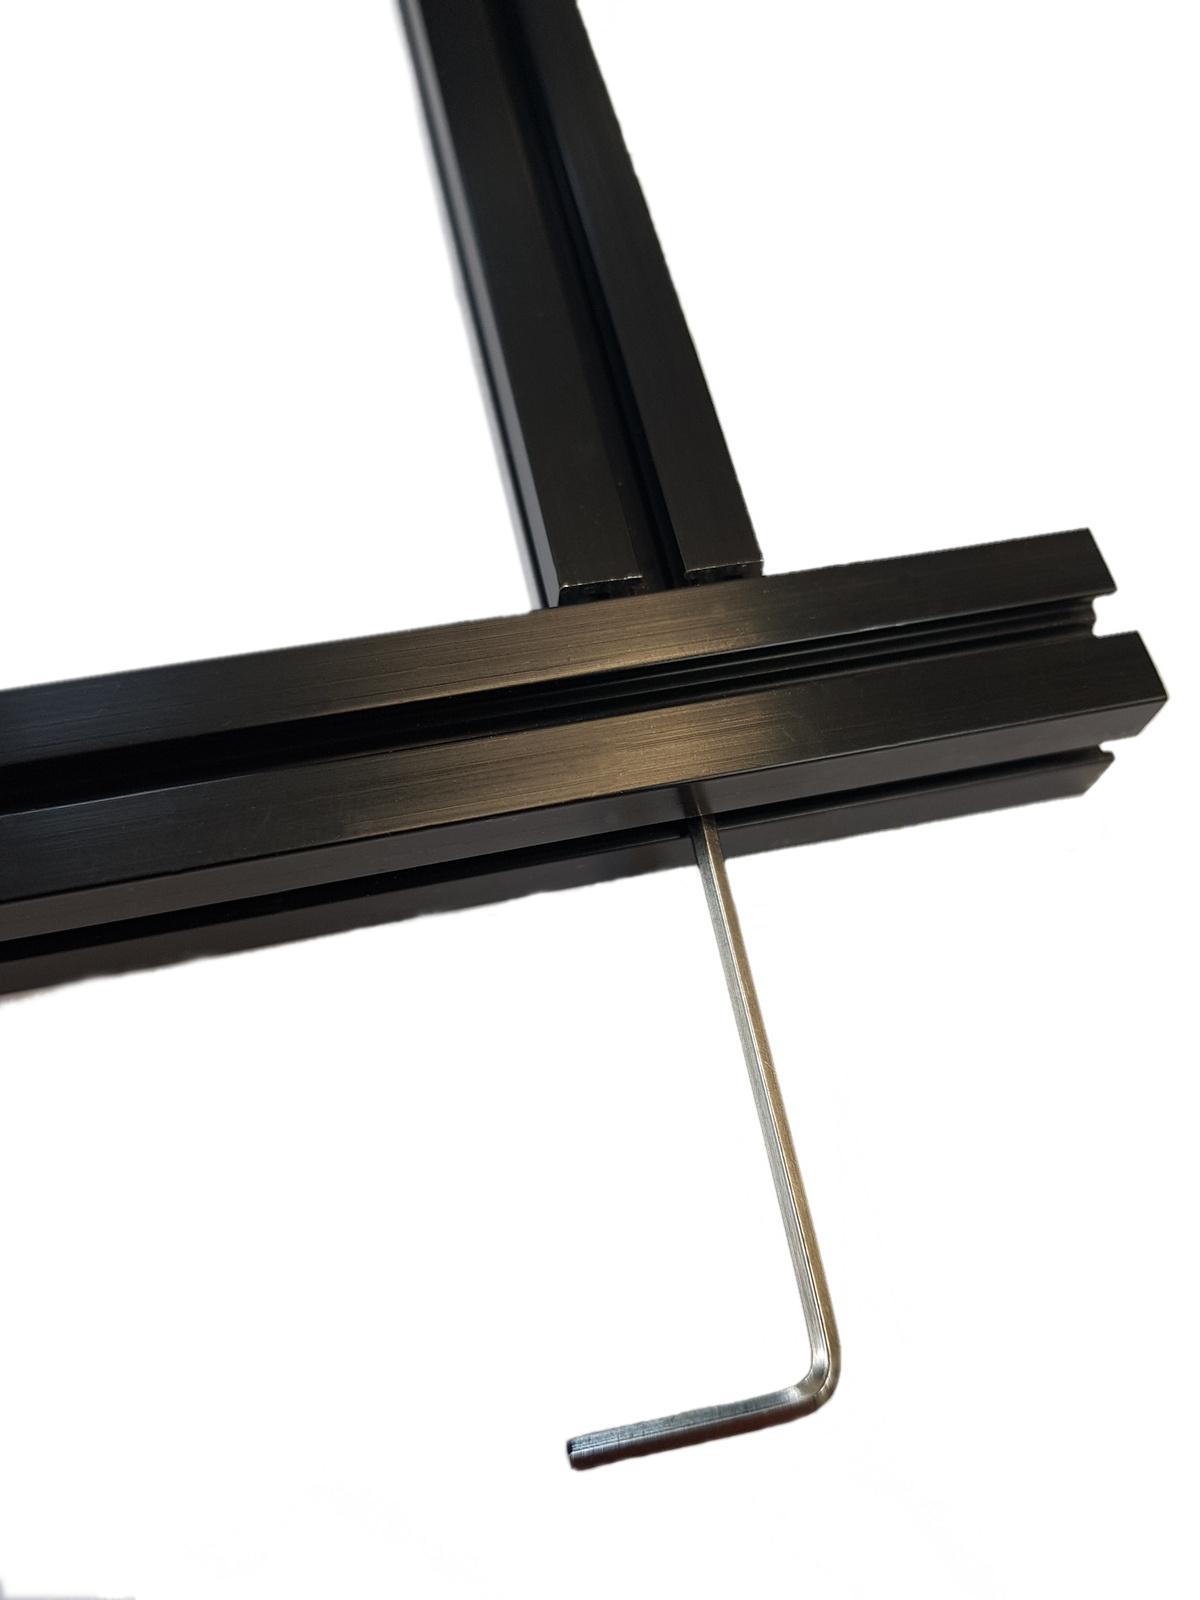 MakerBeamXL - 15x15mm aluminum profile 90 degree blind fastener